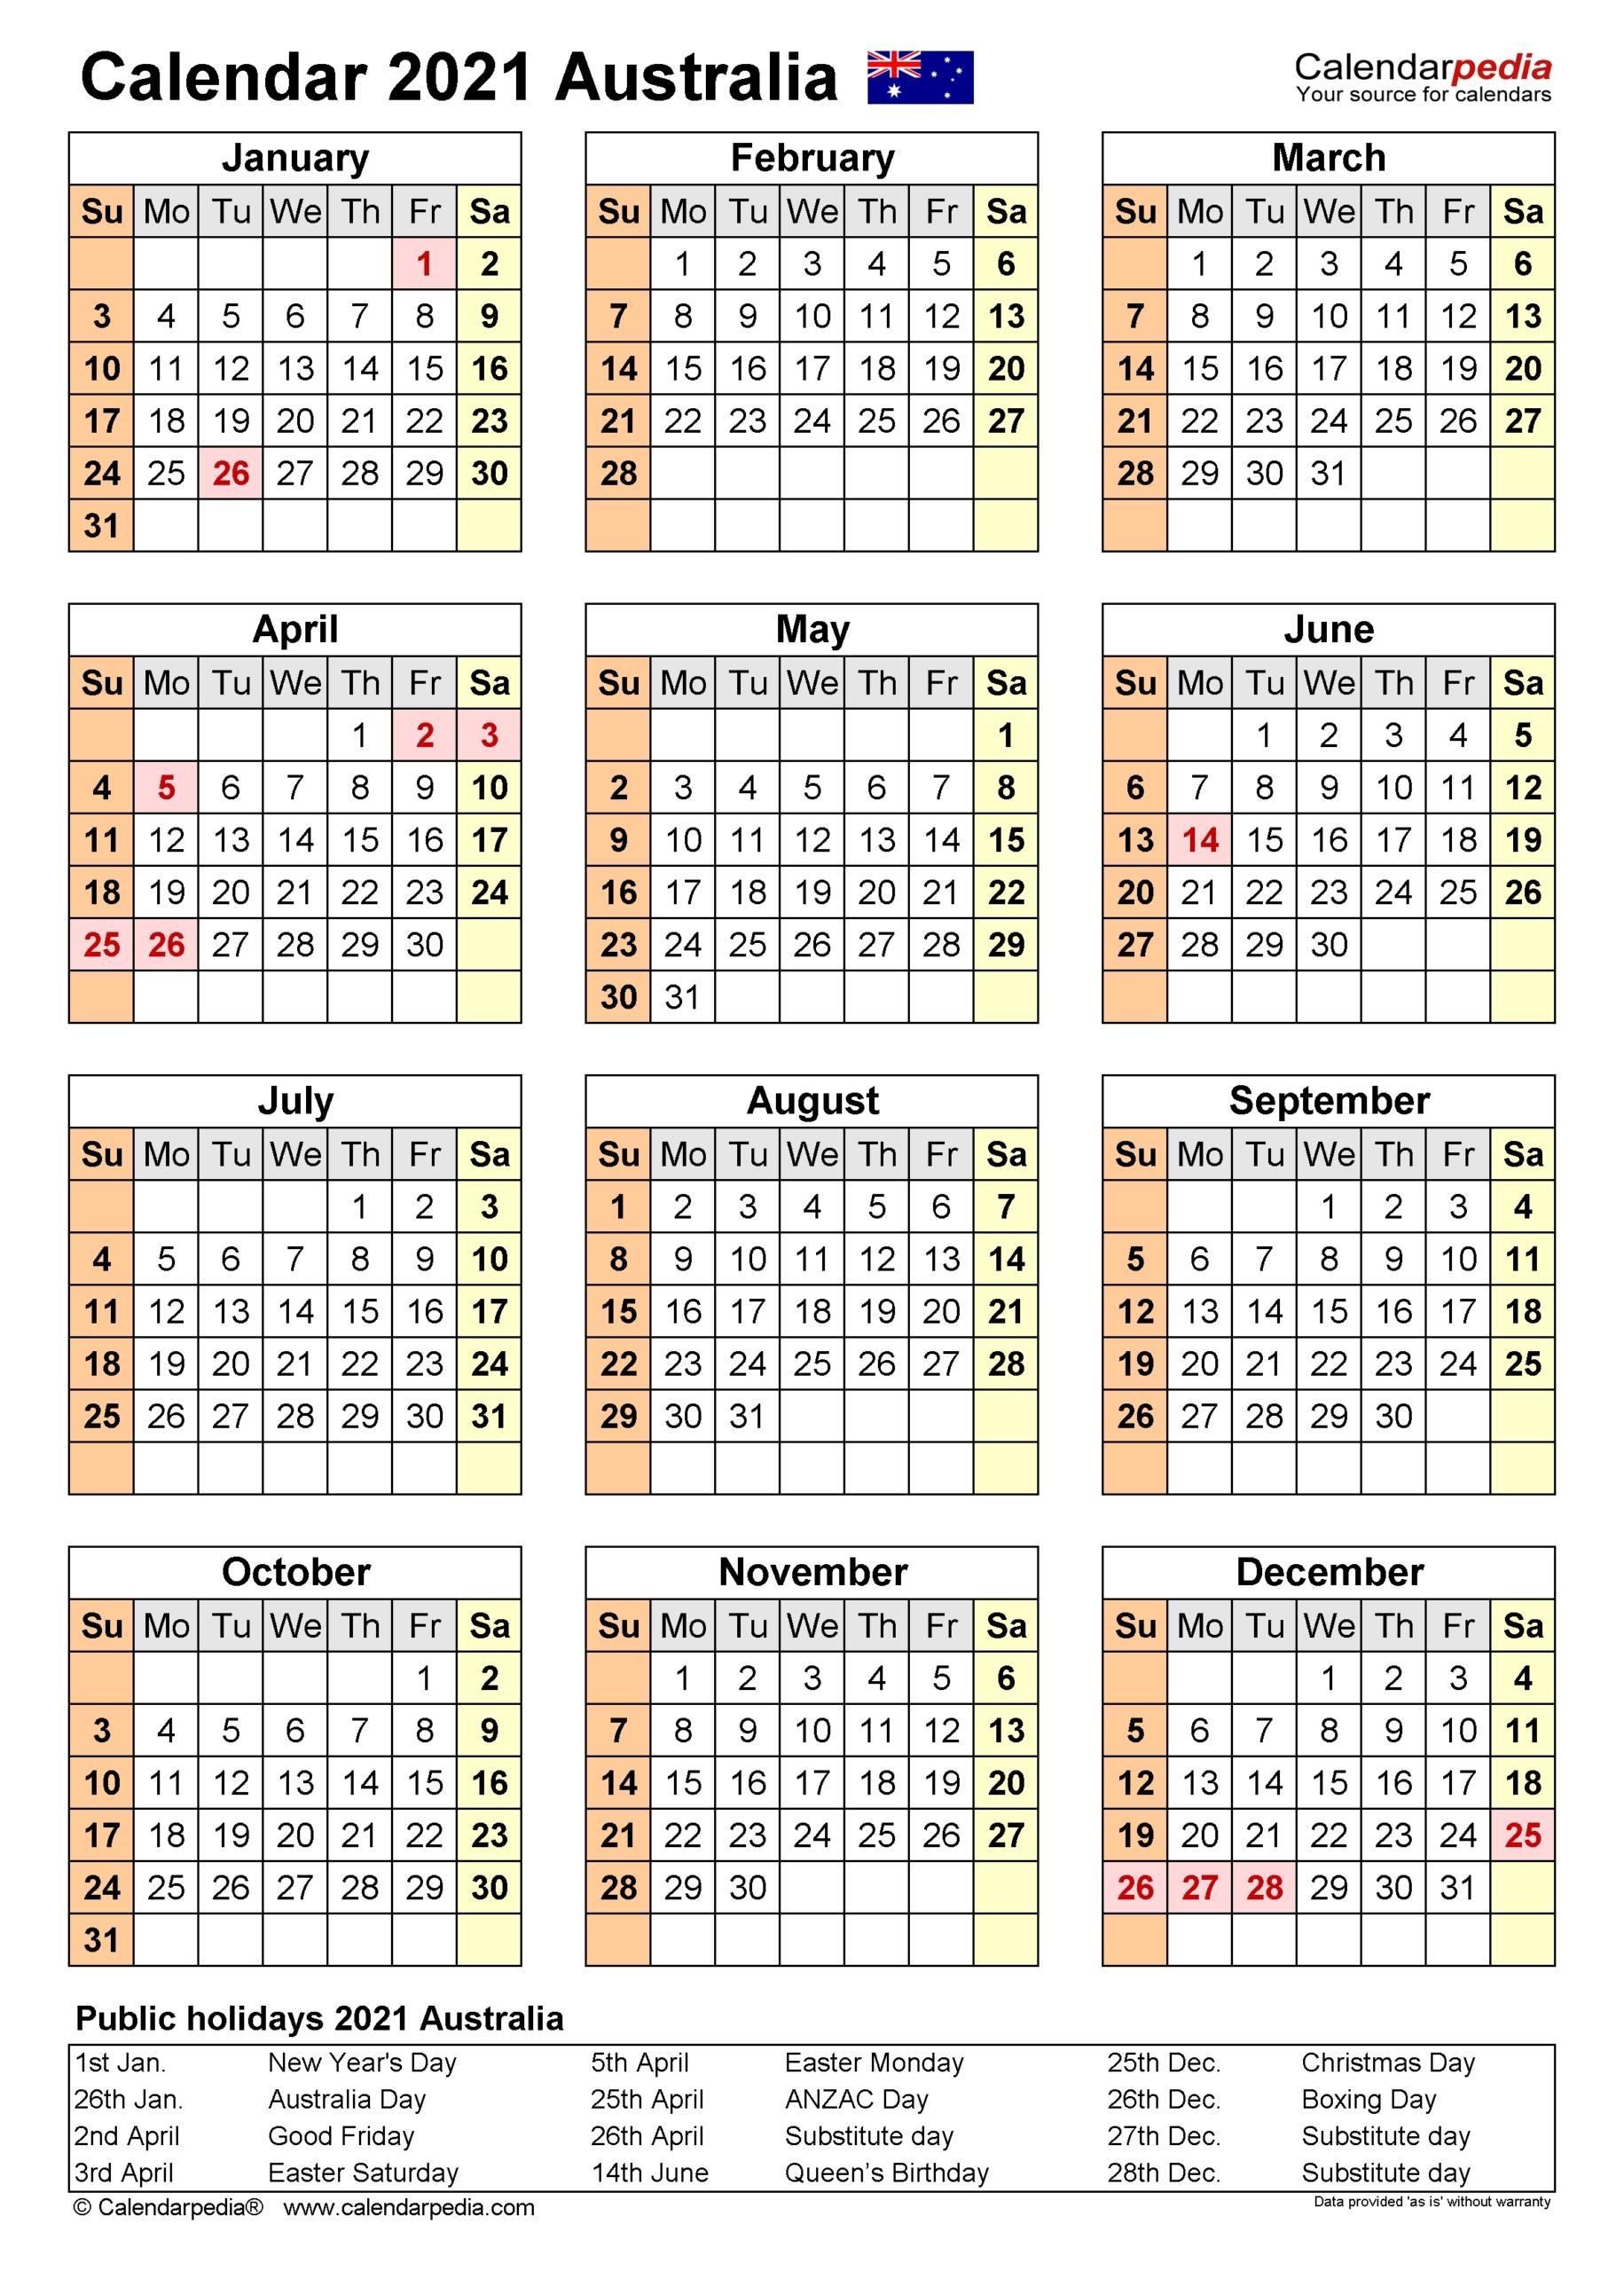 Depo Provera Calendar 2021 Printable   Calendar Printables Free Blank with Two Year Calendar Template 2021 2021 Image